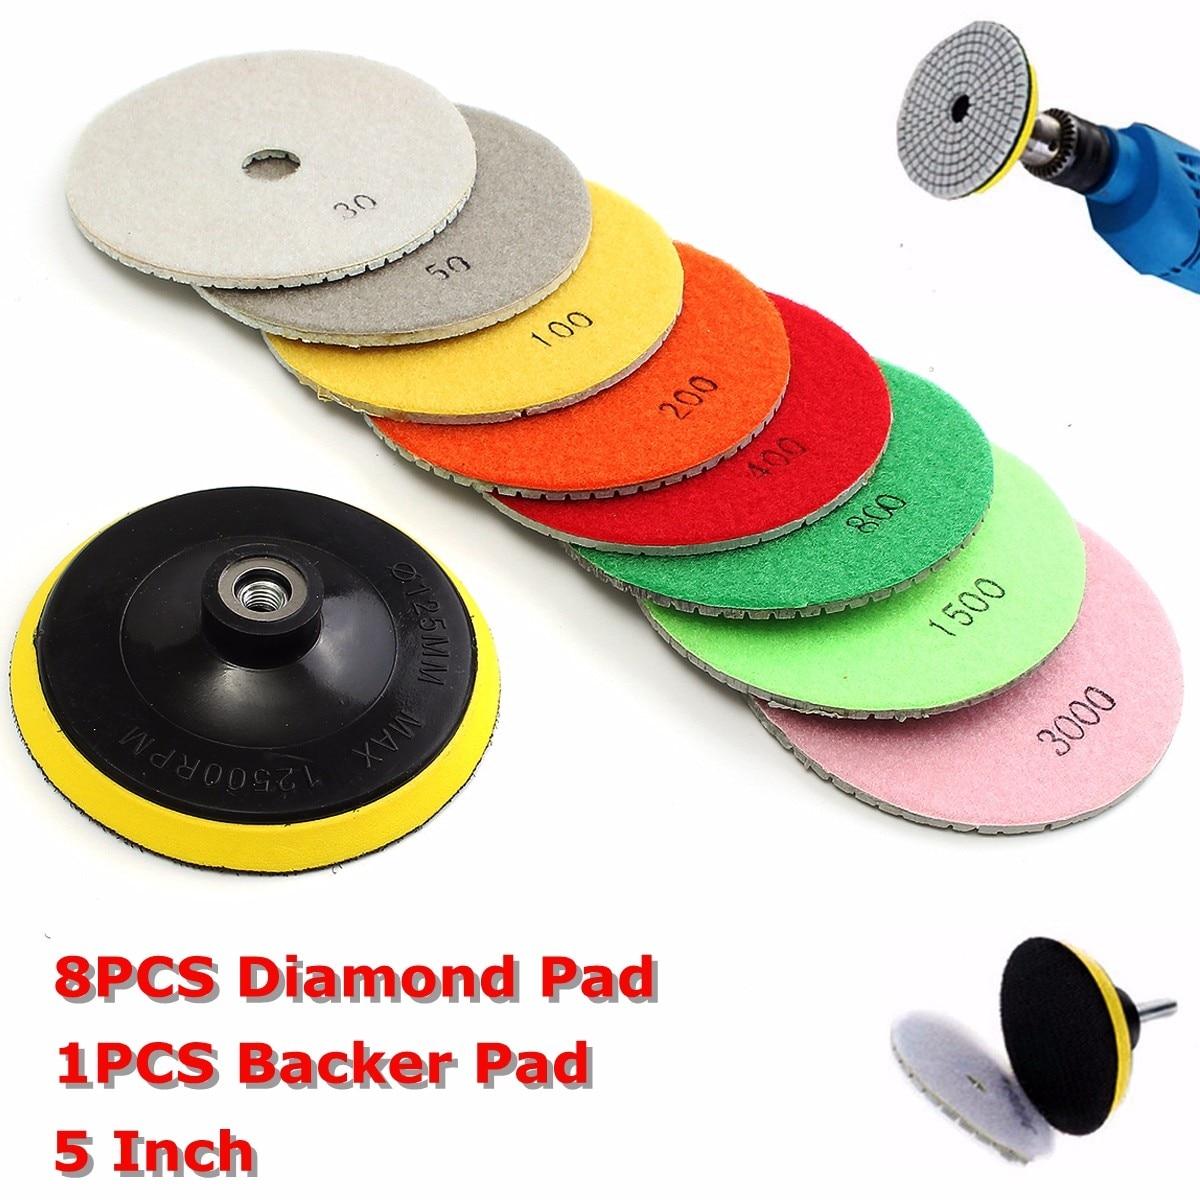 9pcs/set 5 Inch Diamond Polishing Pad Set Wet Dry For Granite Concrete Marble Stone Tiles Diamond Polishing Pad Backer Pad